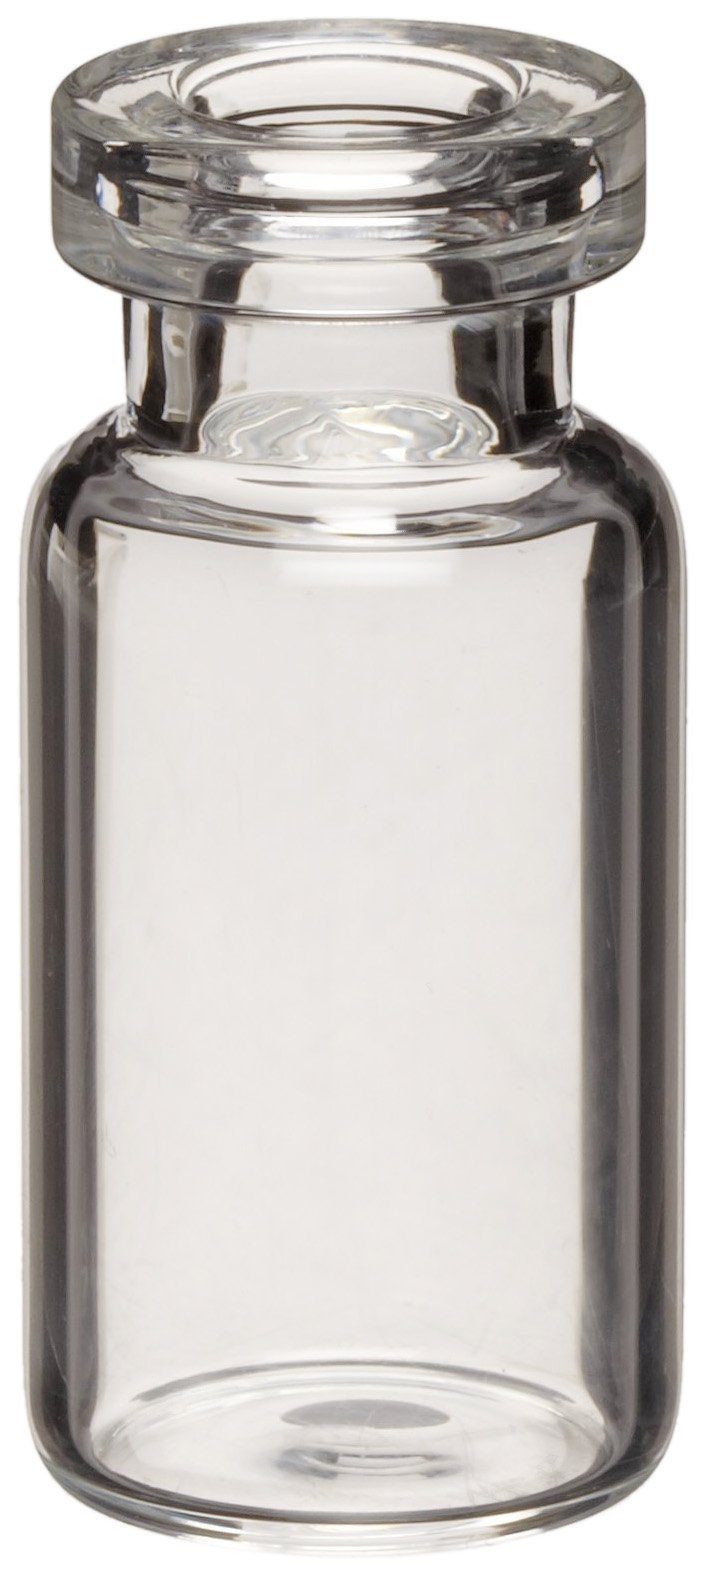 Wheaton 223696 Borosilicate Glass 10mL Serum Tubing Vial, 13mm ID x 20mm OD Mouth, Amber (Case of 144)